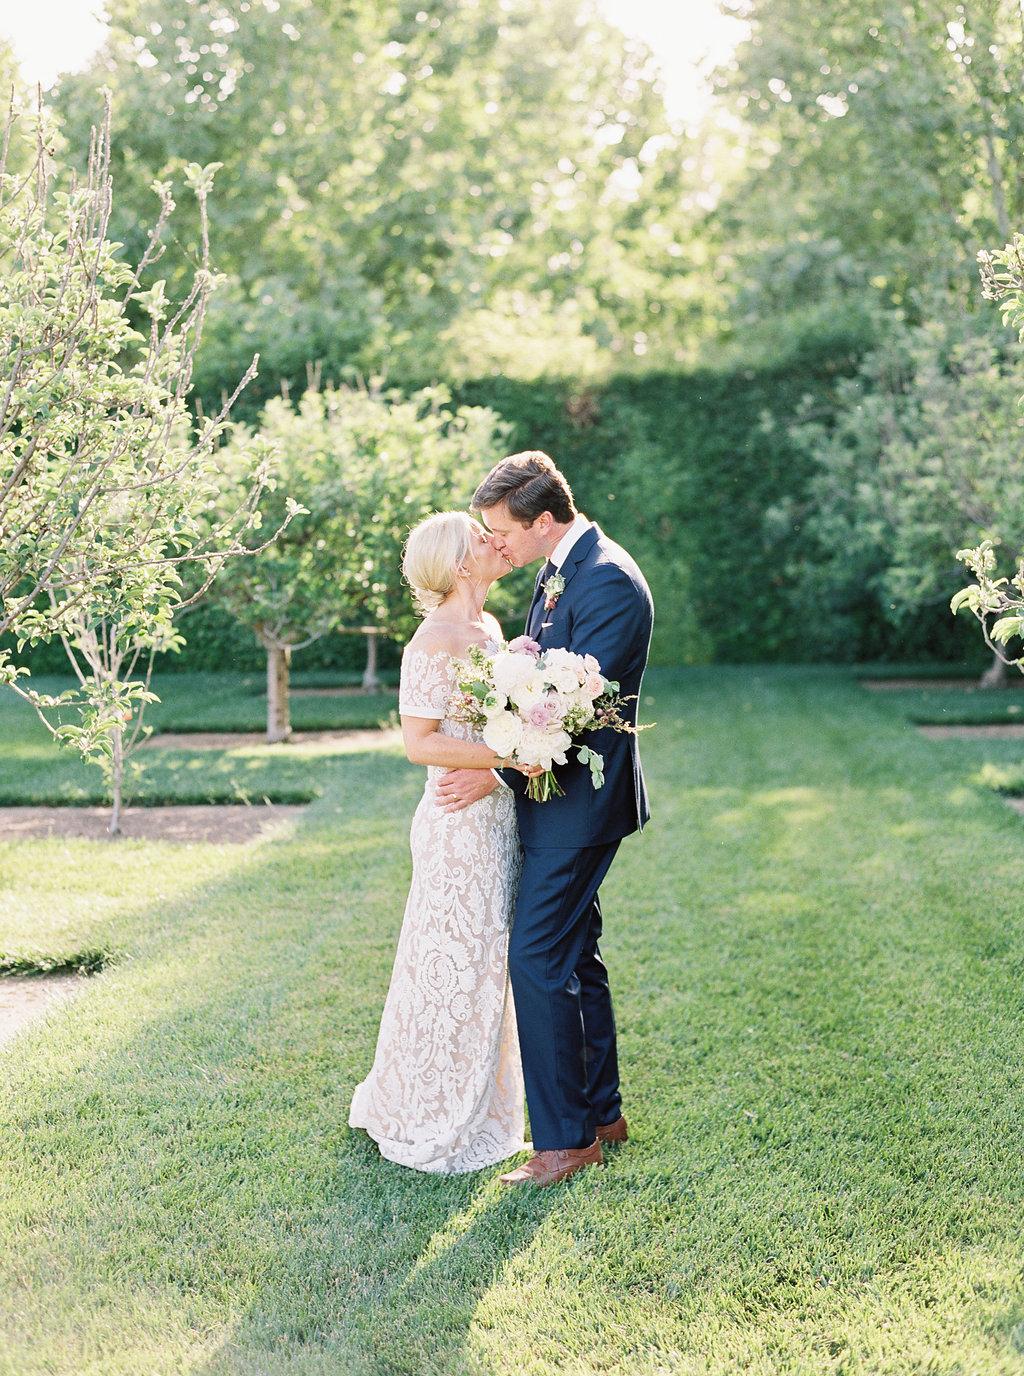 alegria-by-design-wedding-planner-planning-event-design-santa-barbara-day-of-coordinator-kestrel-park-santa-ynez-fields-castle-lavender-garden-mrs-box (28).jpg